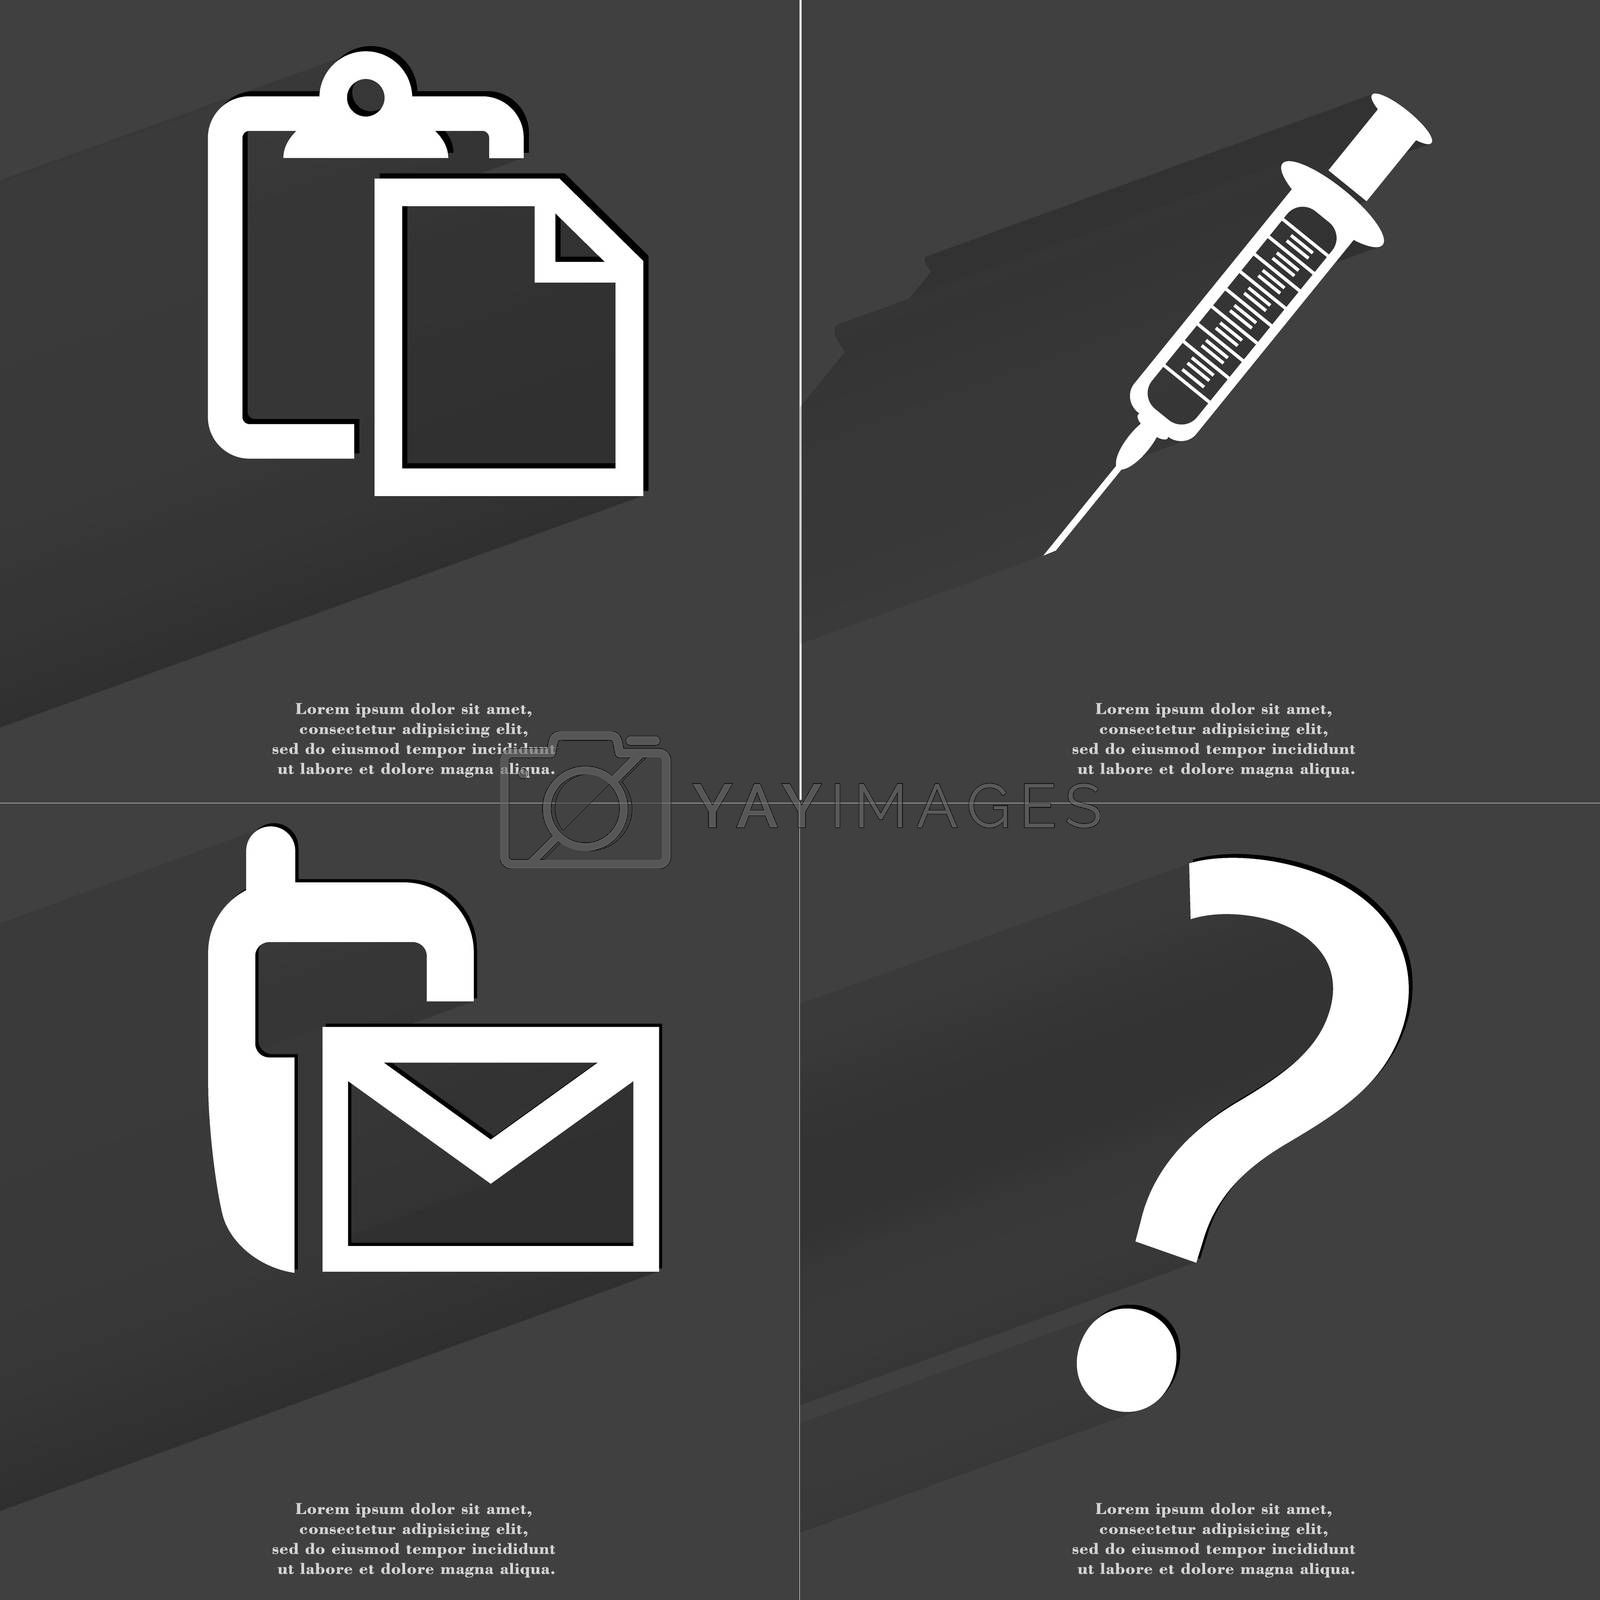 Tasklist, Syringe, SMS icon, Question mark. Symbols with long shadow. Flat design by serhii_lohvyniuk